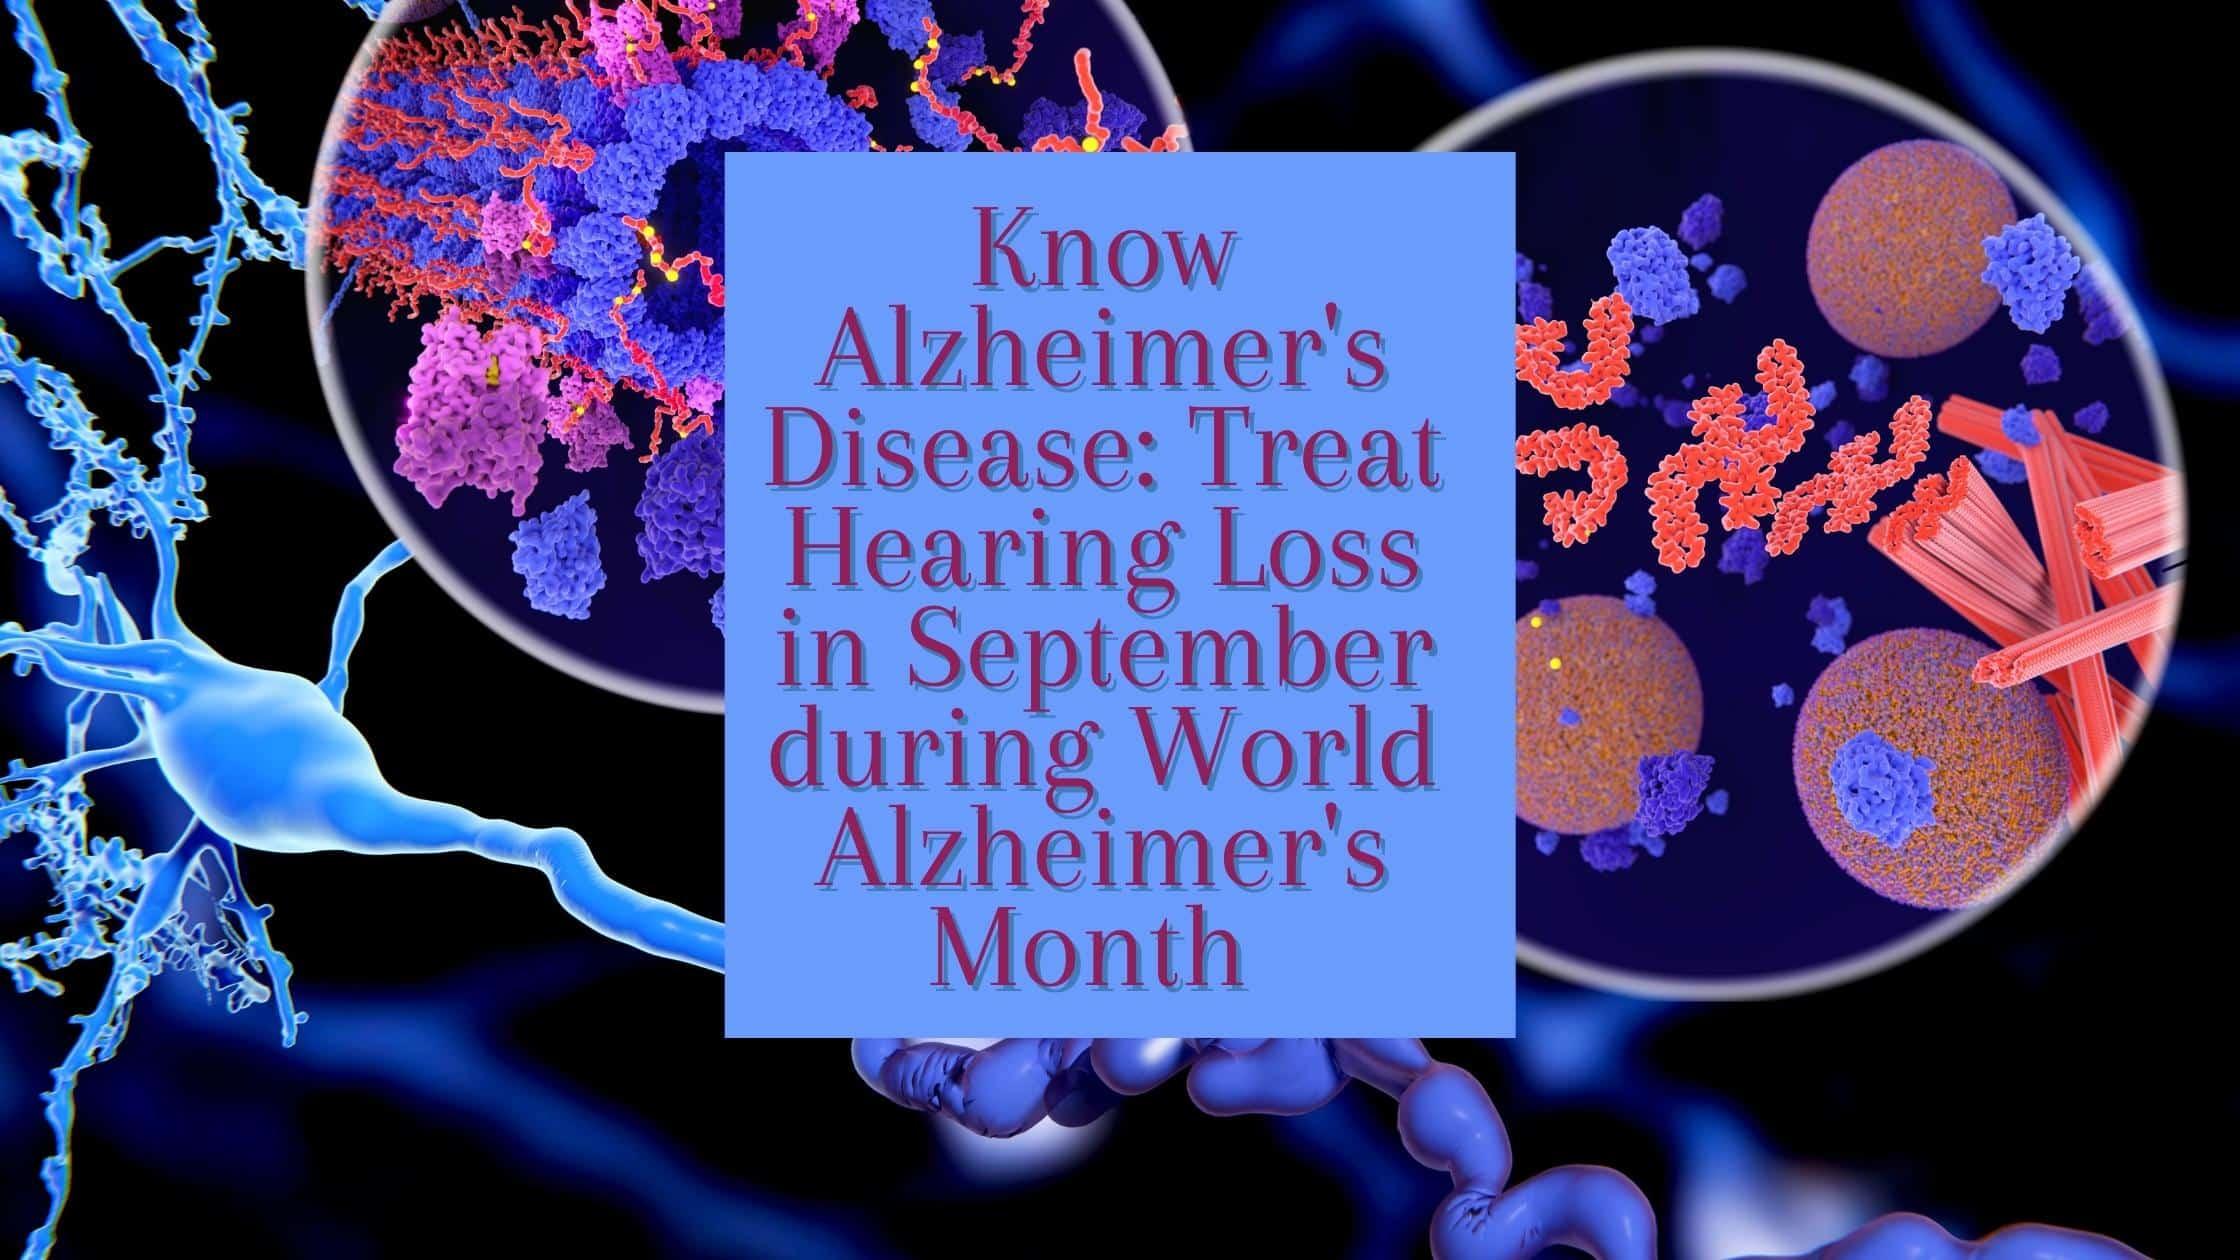 Know Alzheimer's Disease Treat Hearing Loss in September during World Alzheimer's Month